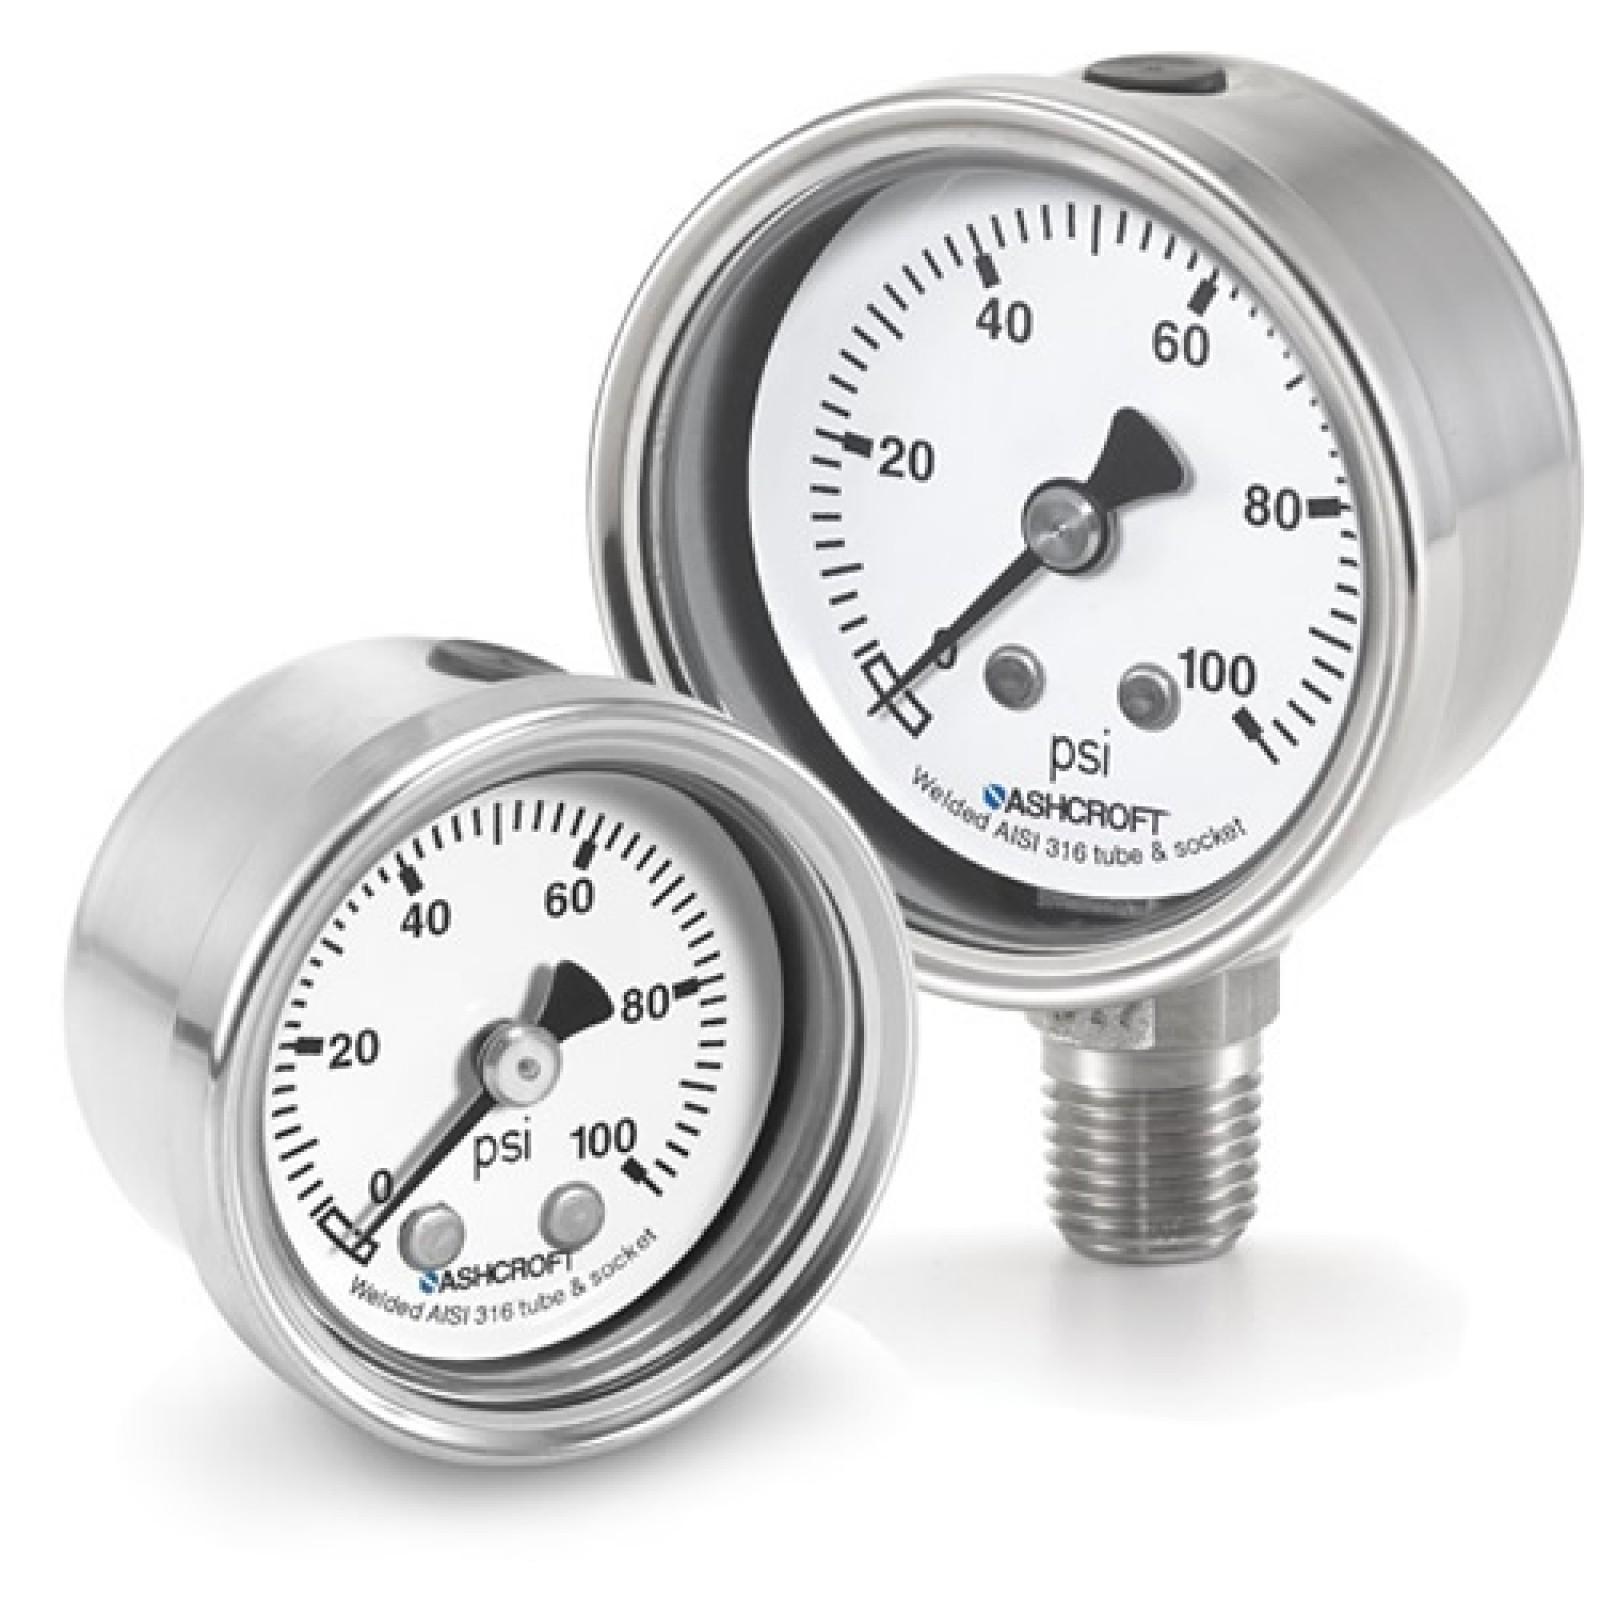 "63 1008S 02B XLL 100#/KP - Pressure Gauge, 63mm stainless 1/4"" NPT Back conn & Case, Plus Performance, 0/100 psi"